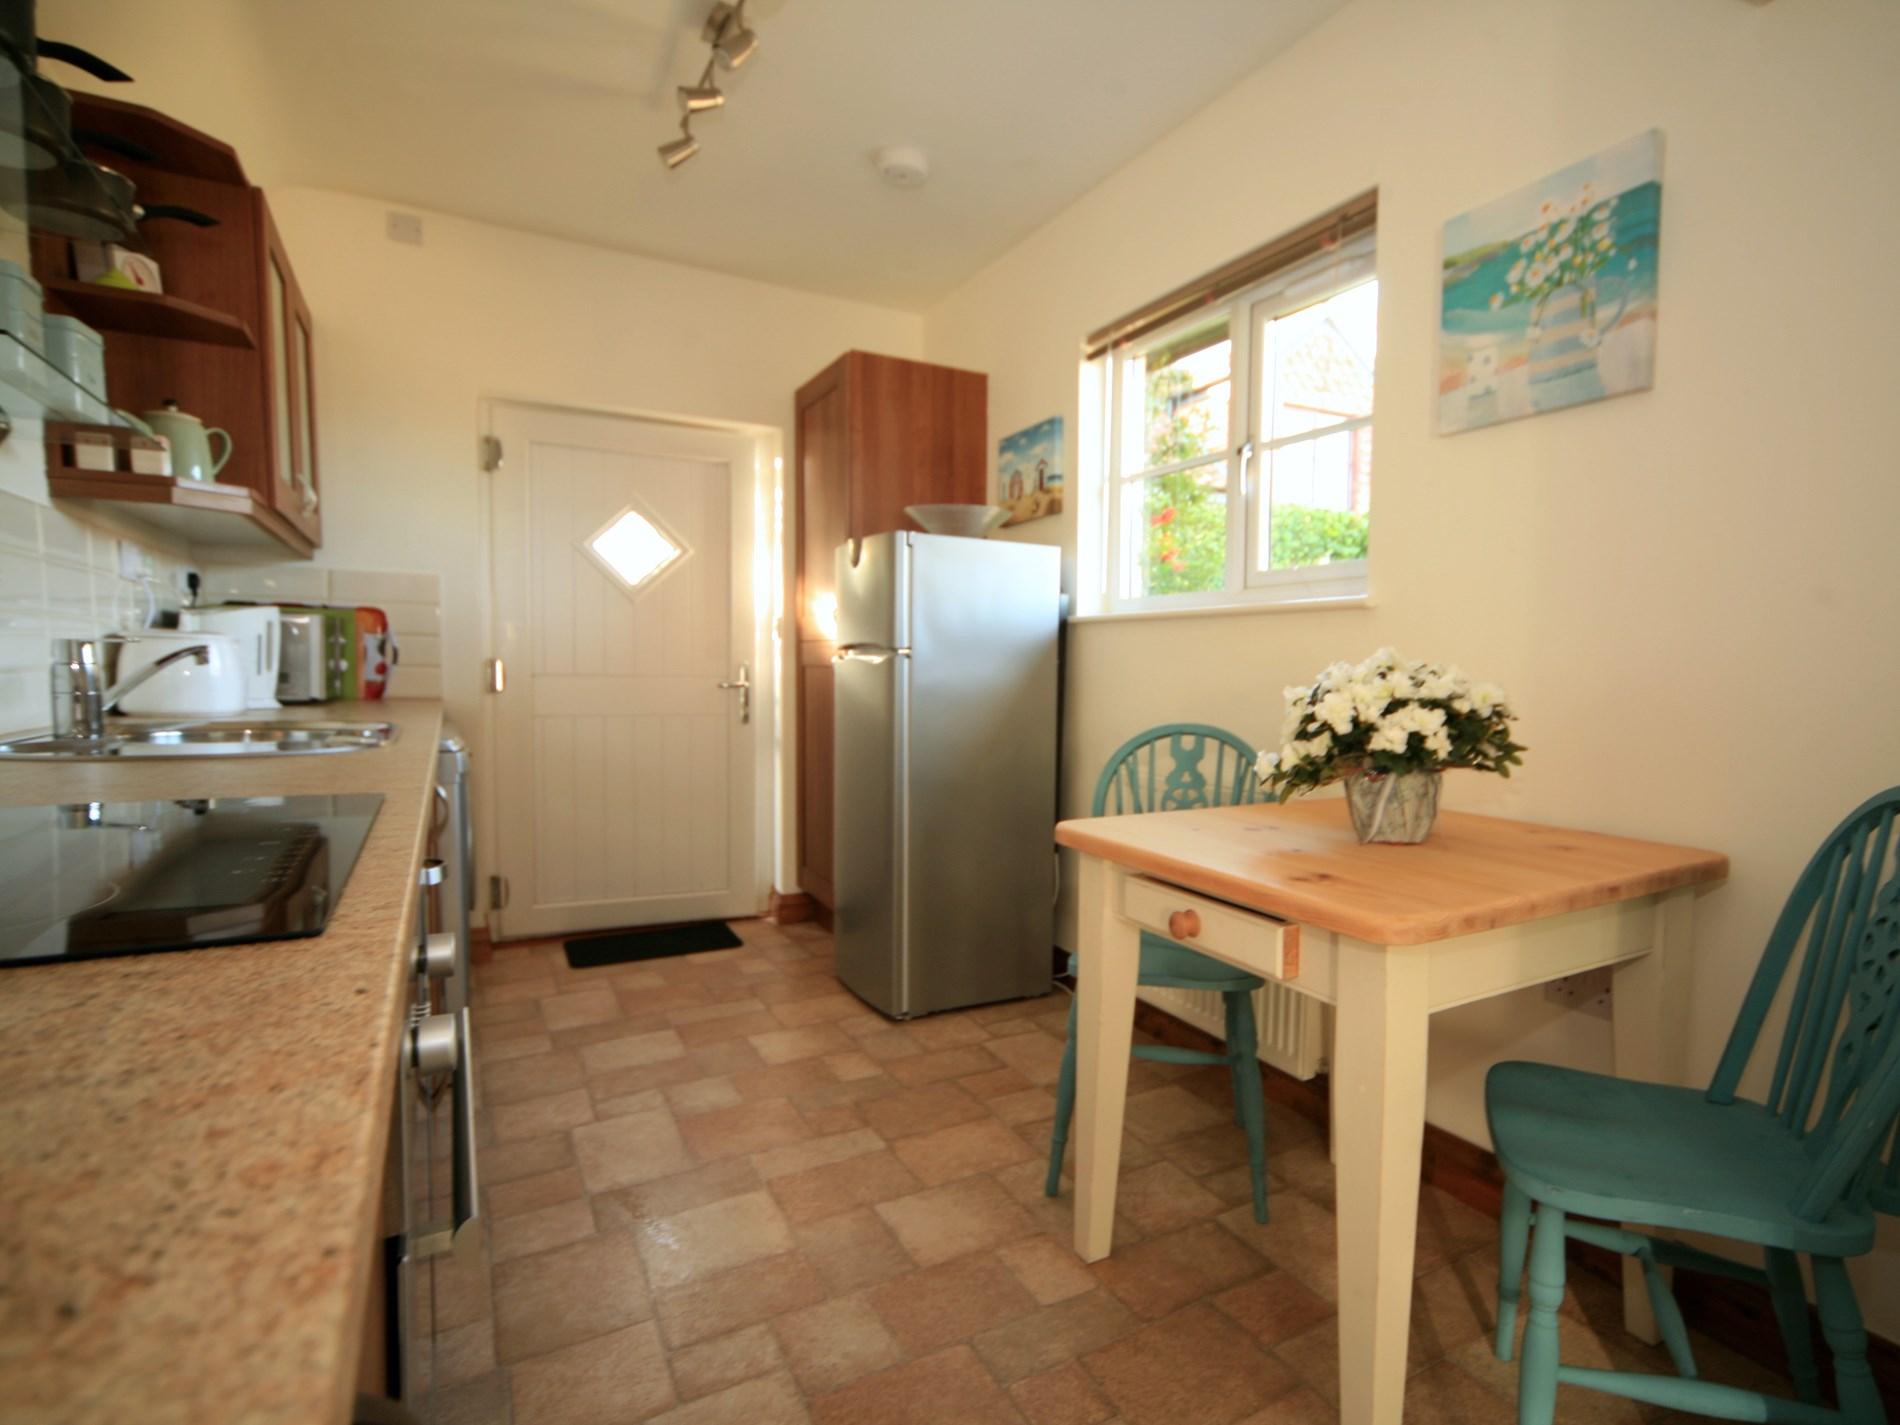 1 Bedroom Cottage in Wedmore, Dorset and Somerset